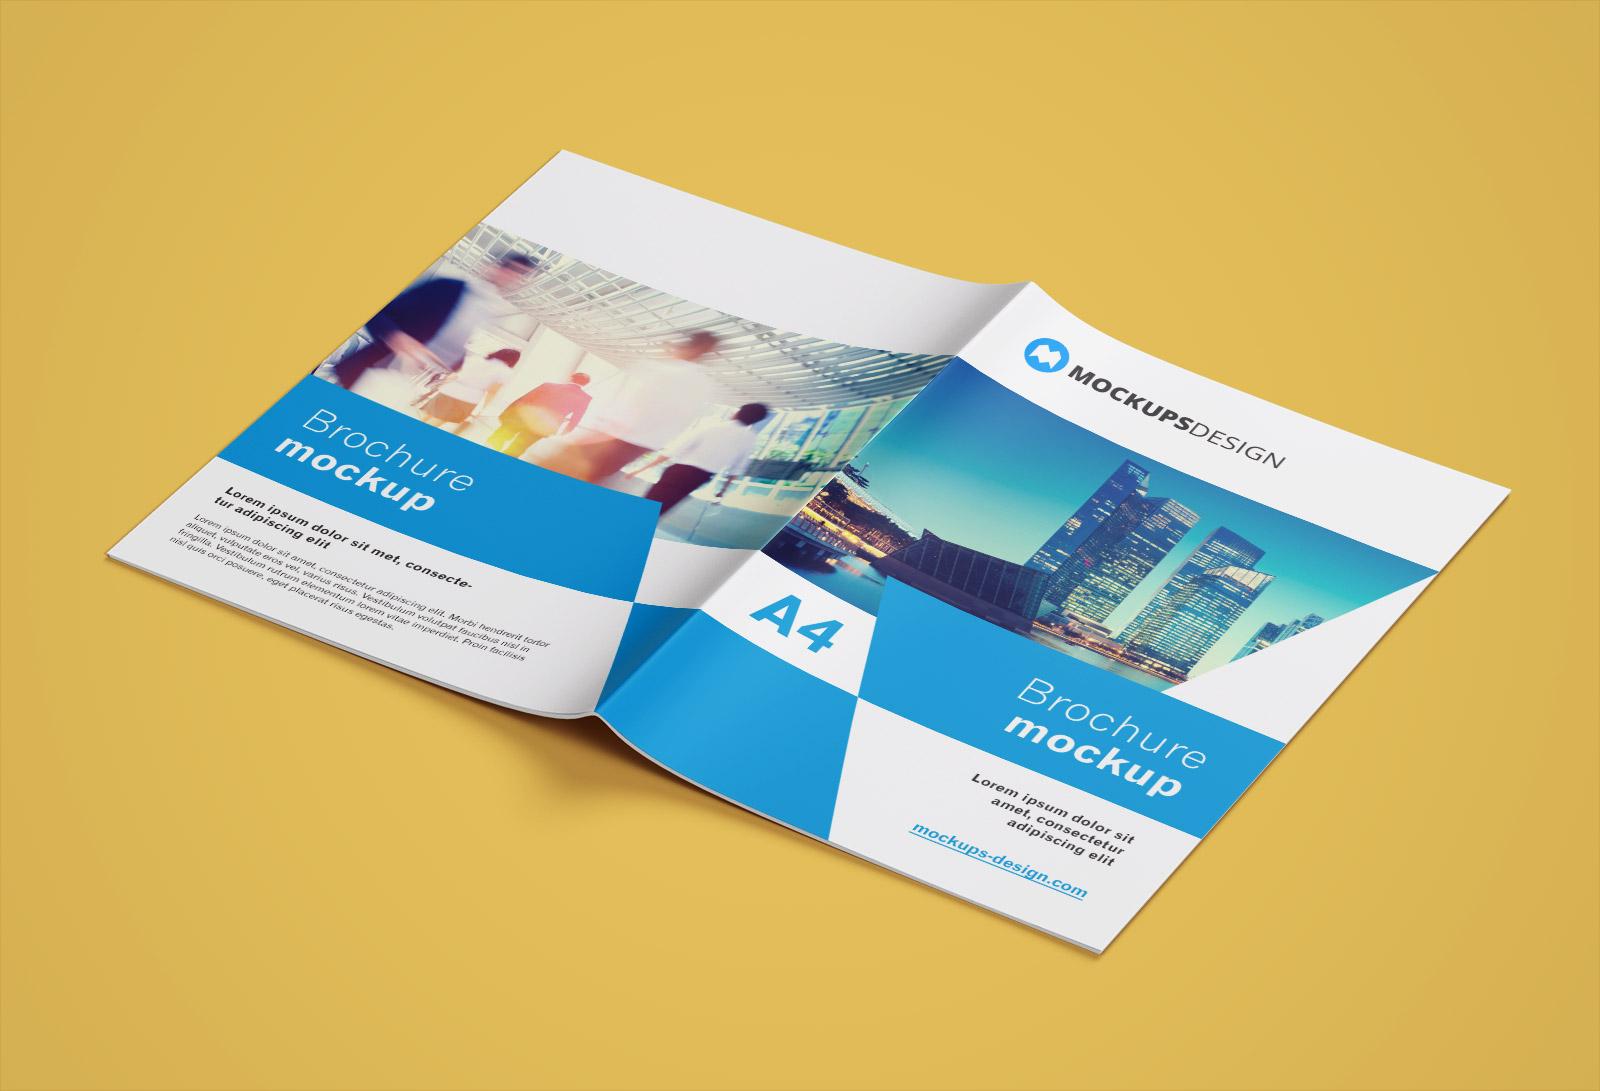 Free A4 Brochure Company Profile Mockup PSD (8)